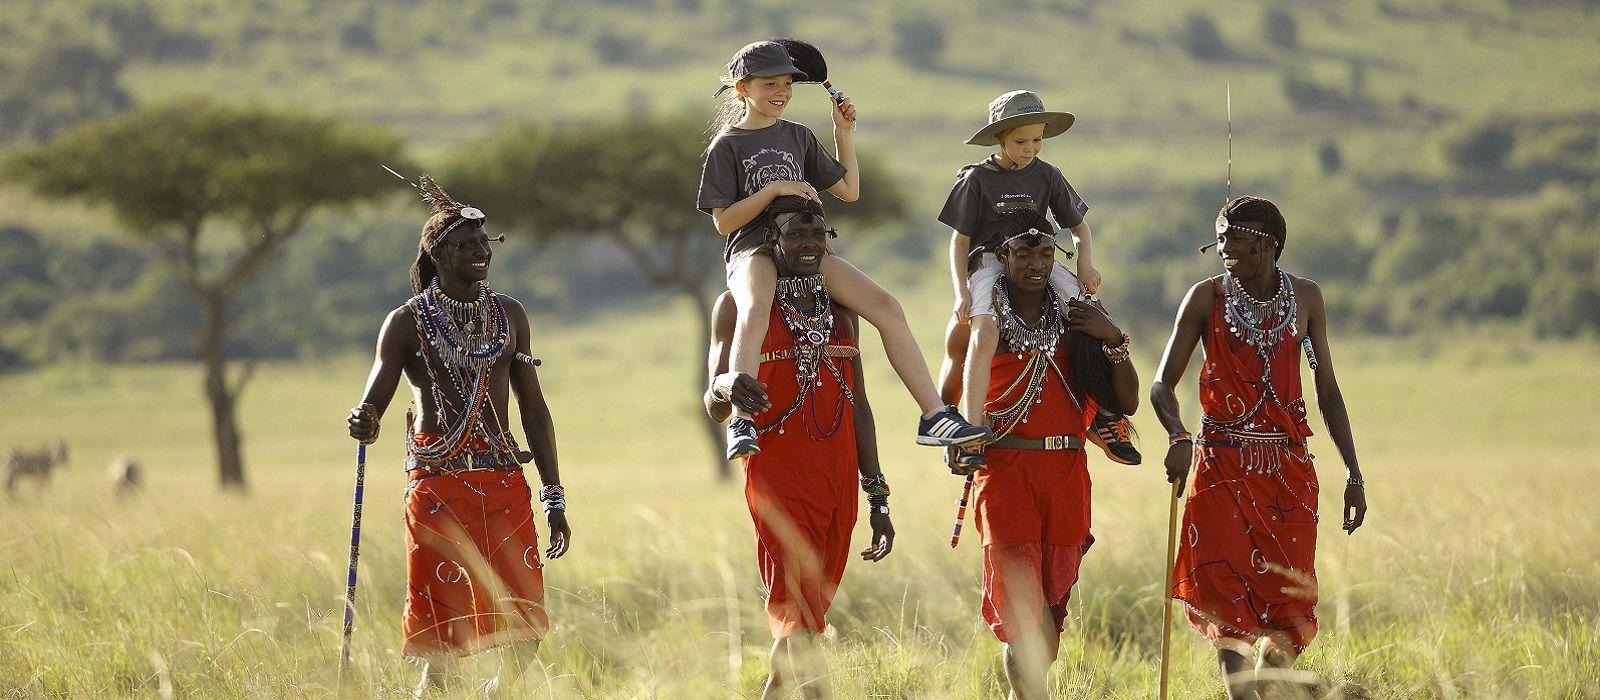 Atua Enkop Exclusive: Kenya Safari and Beach Break Tour Trip 1